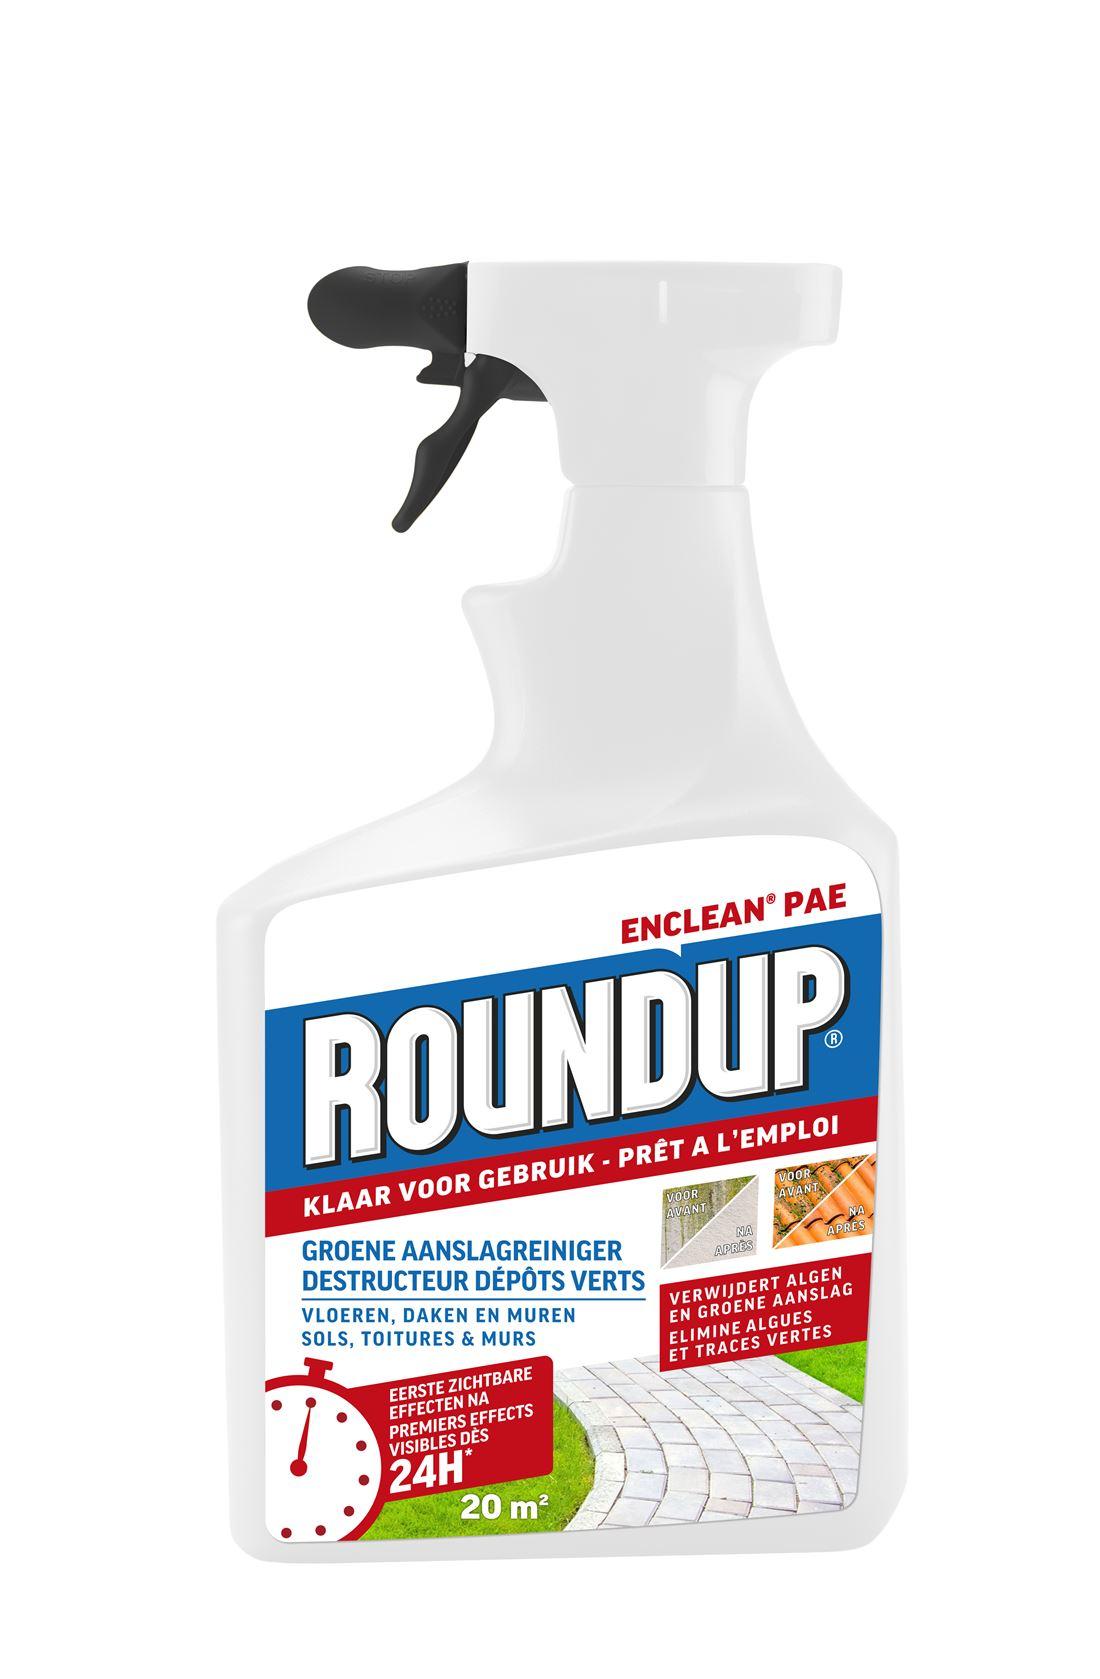 Roundup-Enclean-PAE-Spray-1L